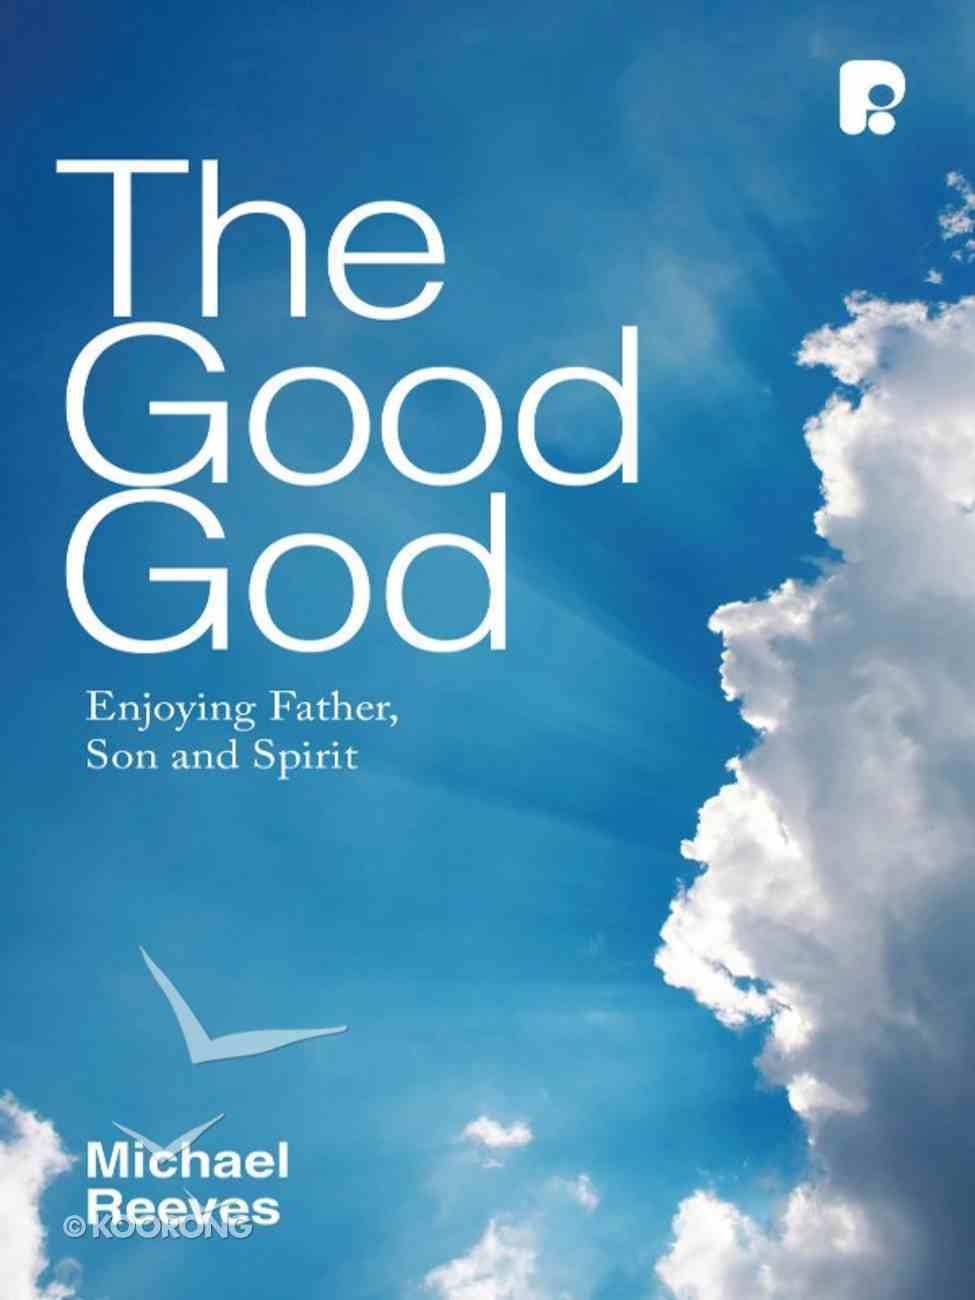 The Good God: Enjoying Father, Son, and Spirit eBook